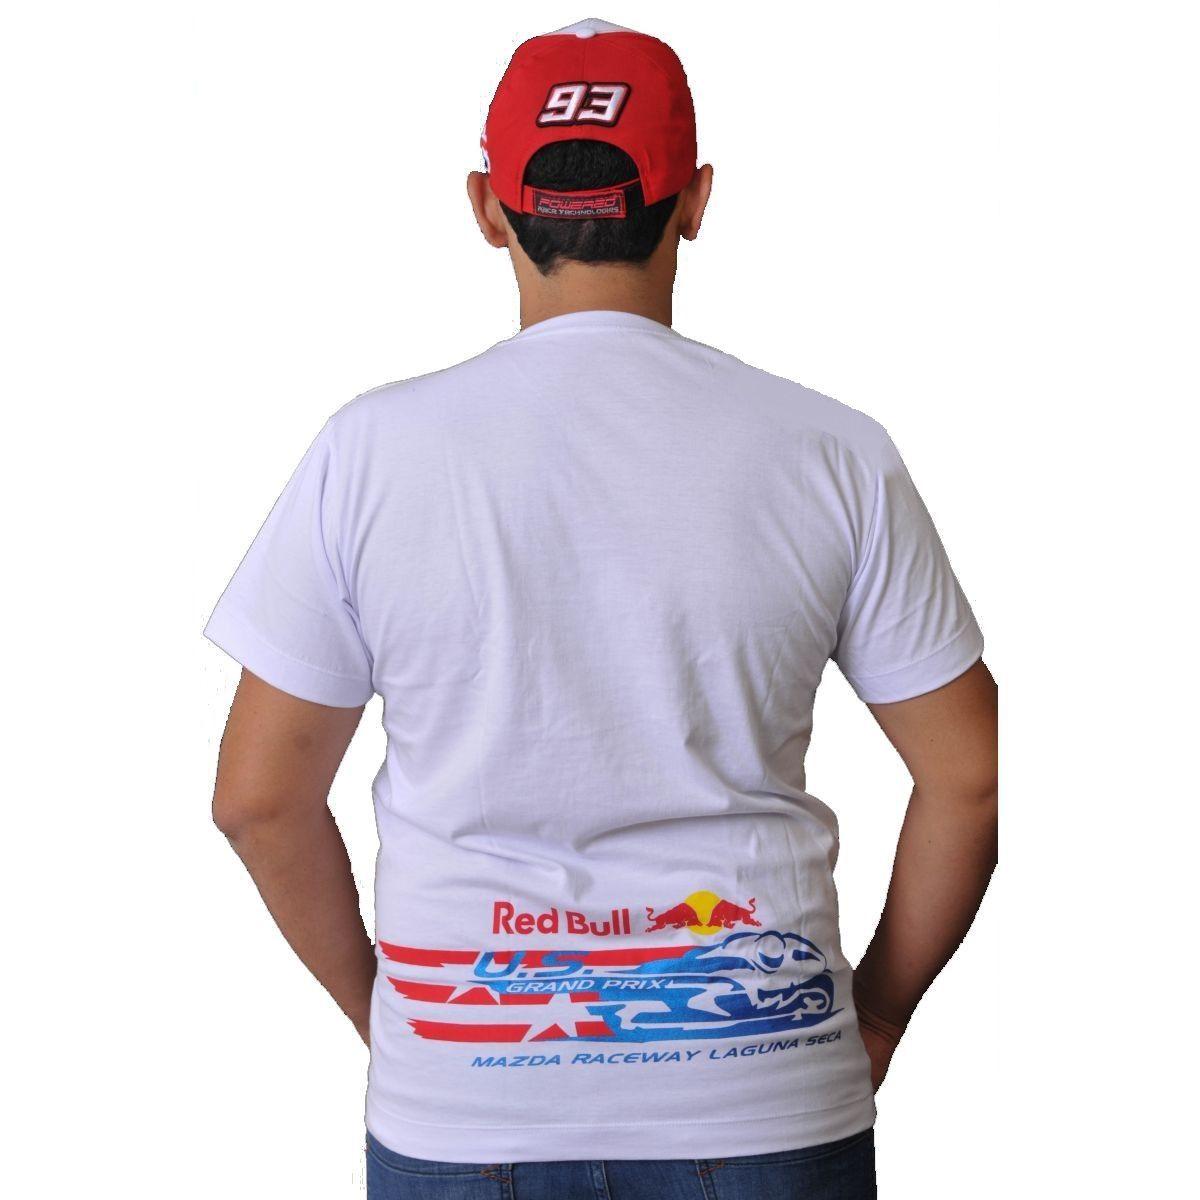 Camiseta Red Bull Original Powered